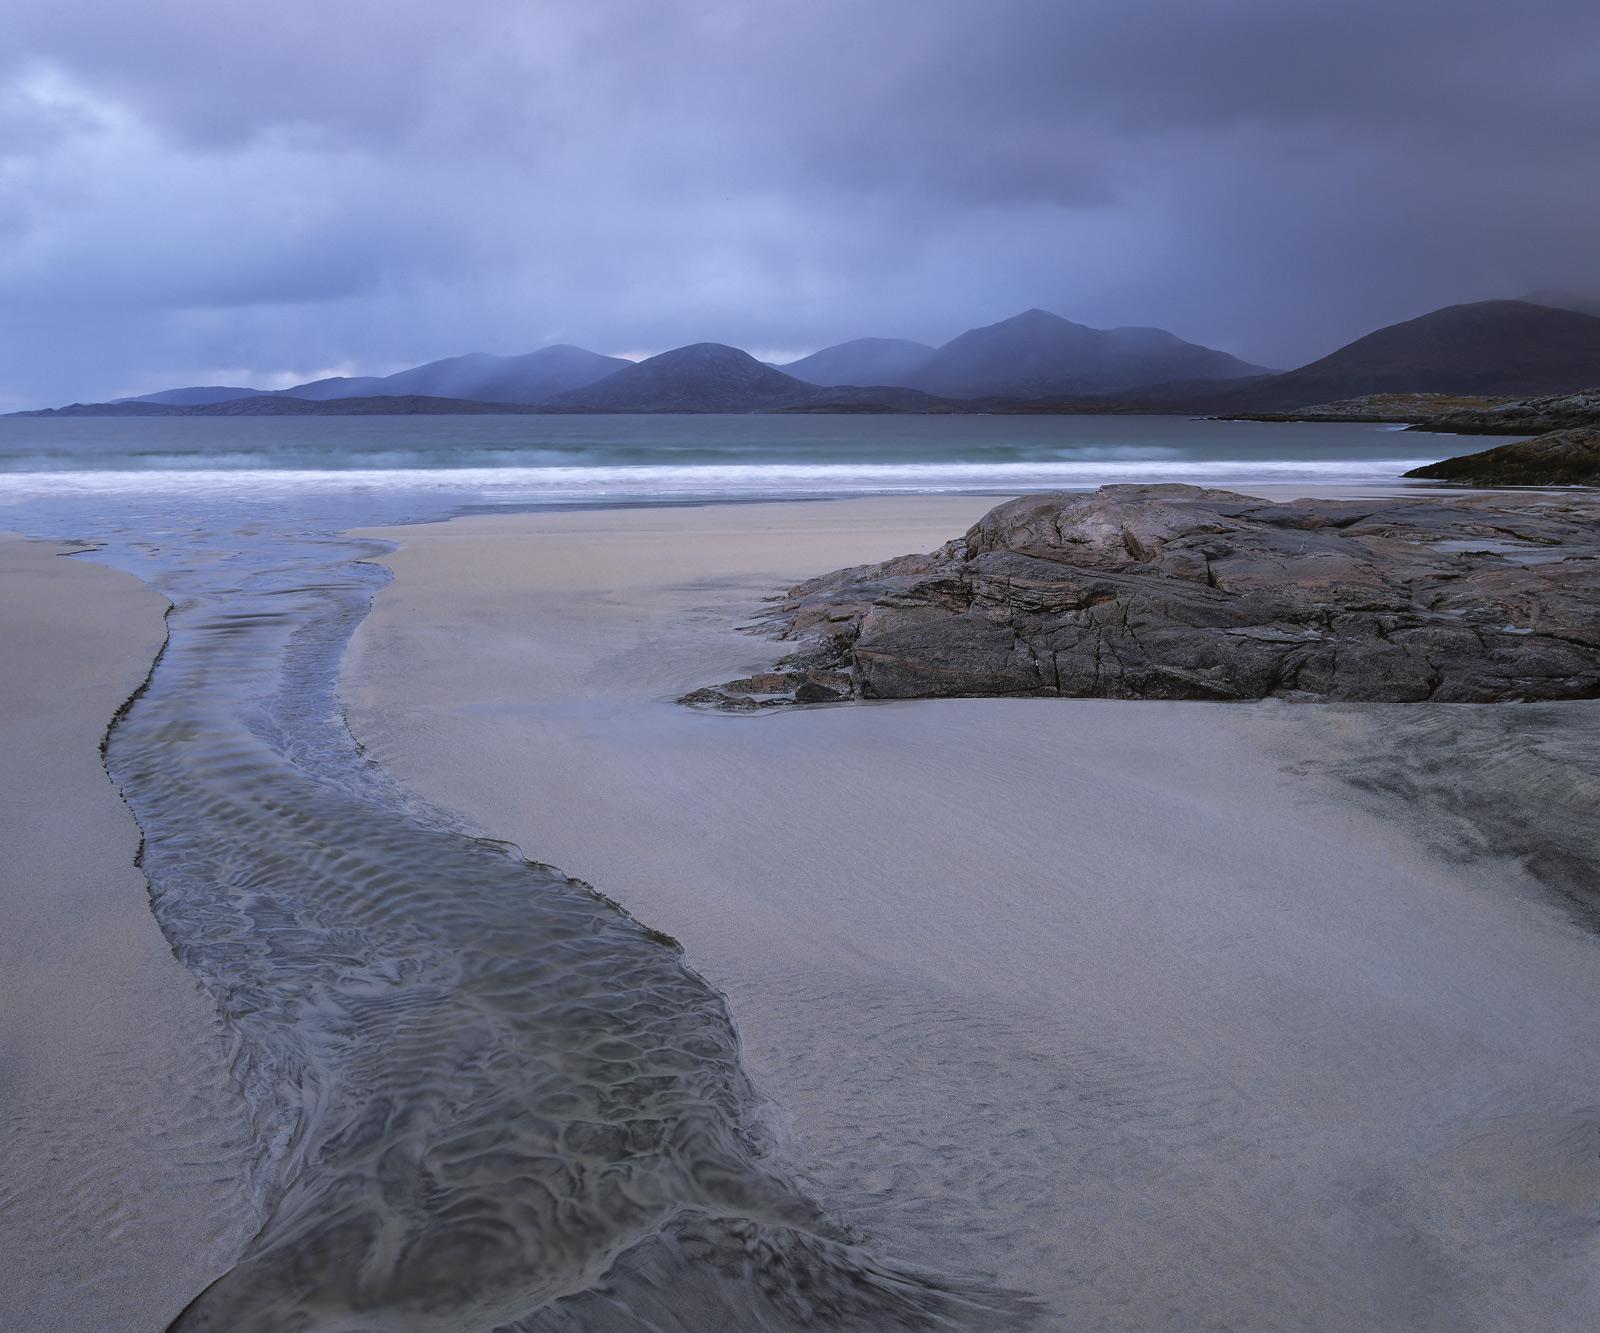 Rosamol Blues, Traigh Rosamol, Harris, Scotland, blueberry, ripple, peaks, rain, storm, pattinated, sand, gneiss, rock, , photo